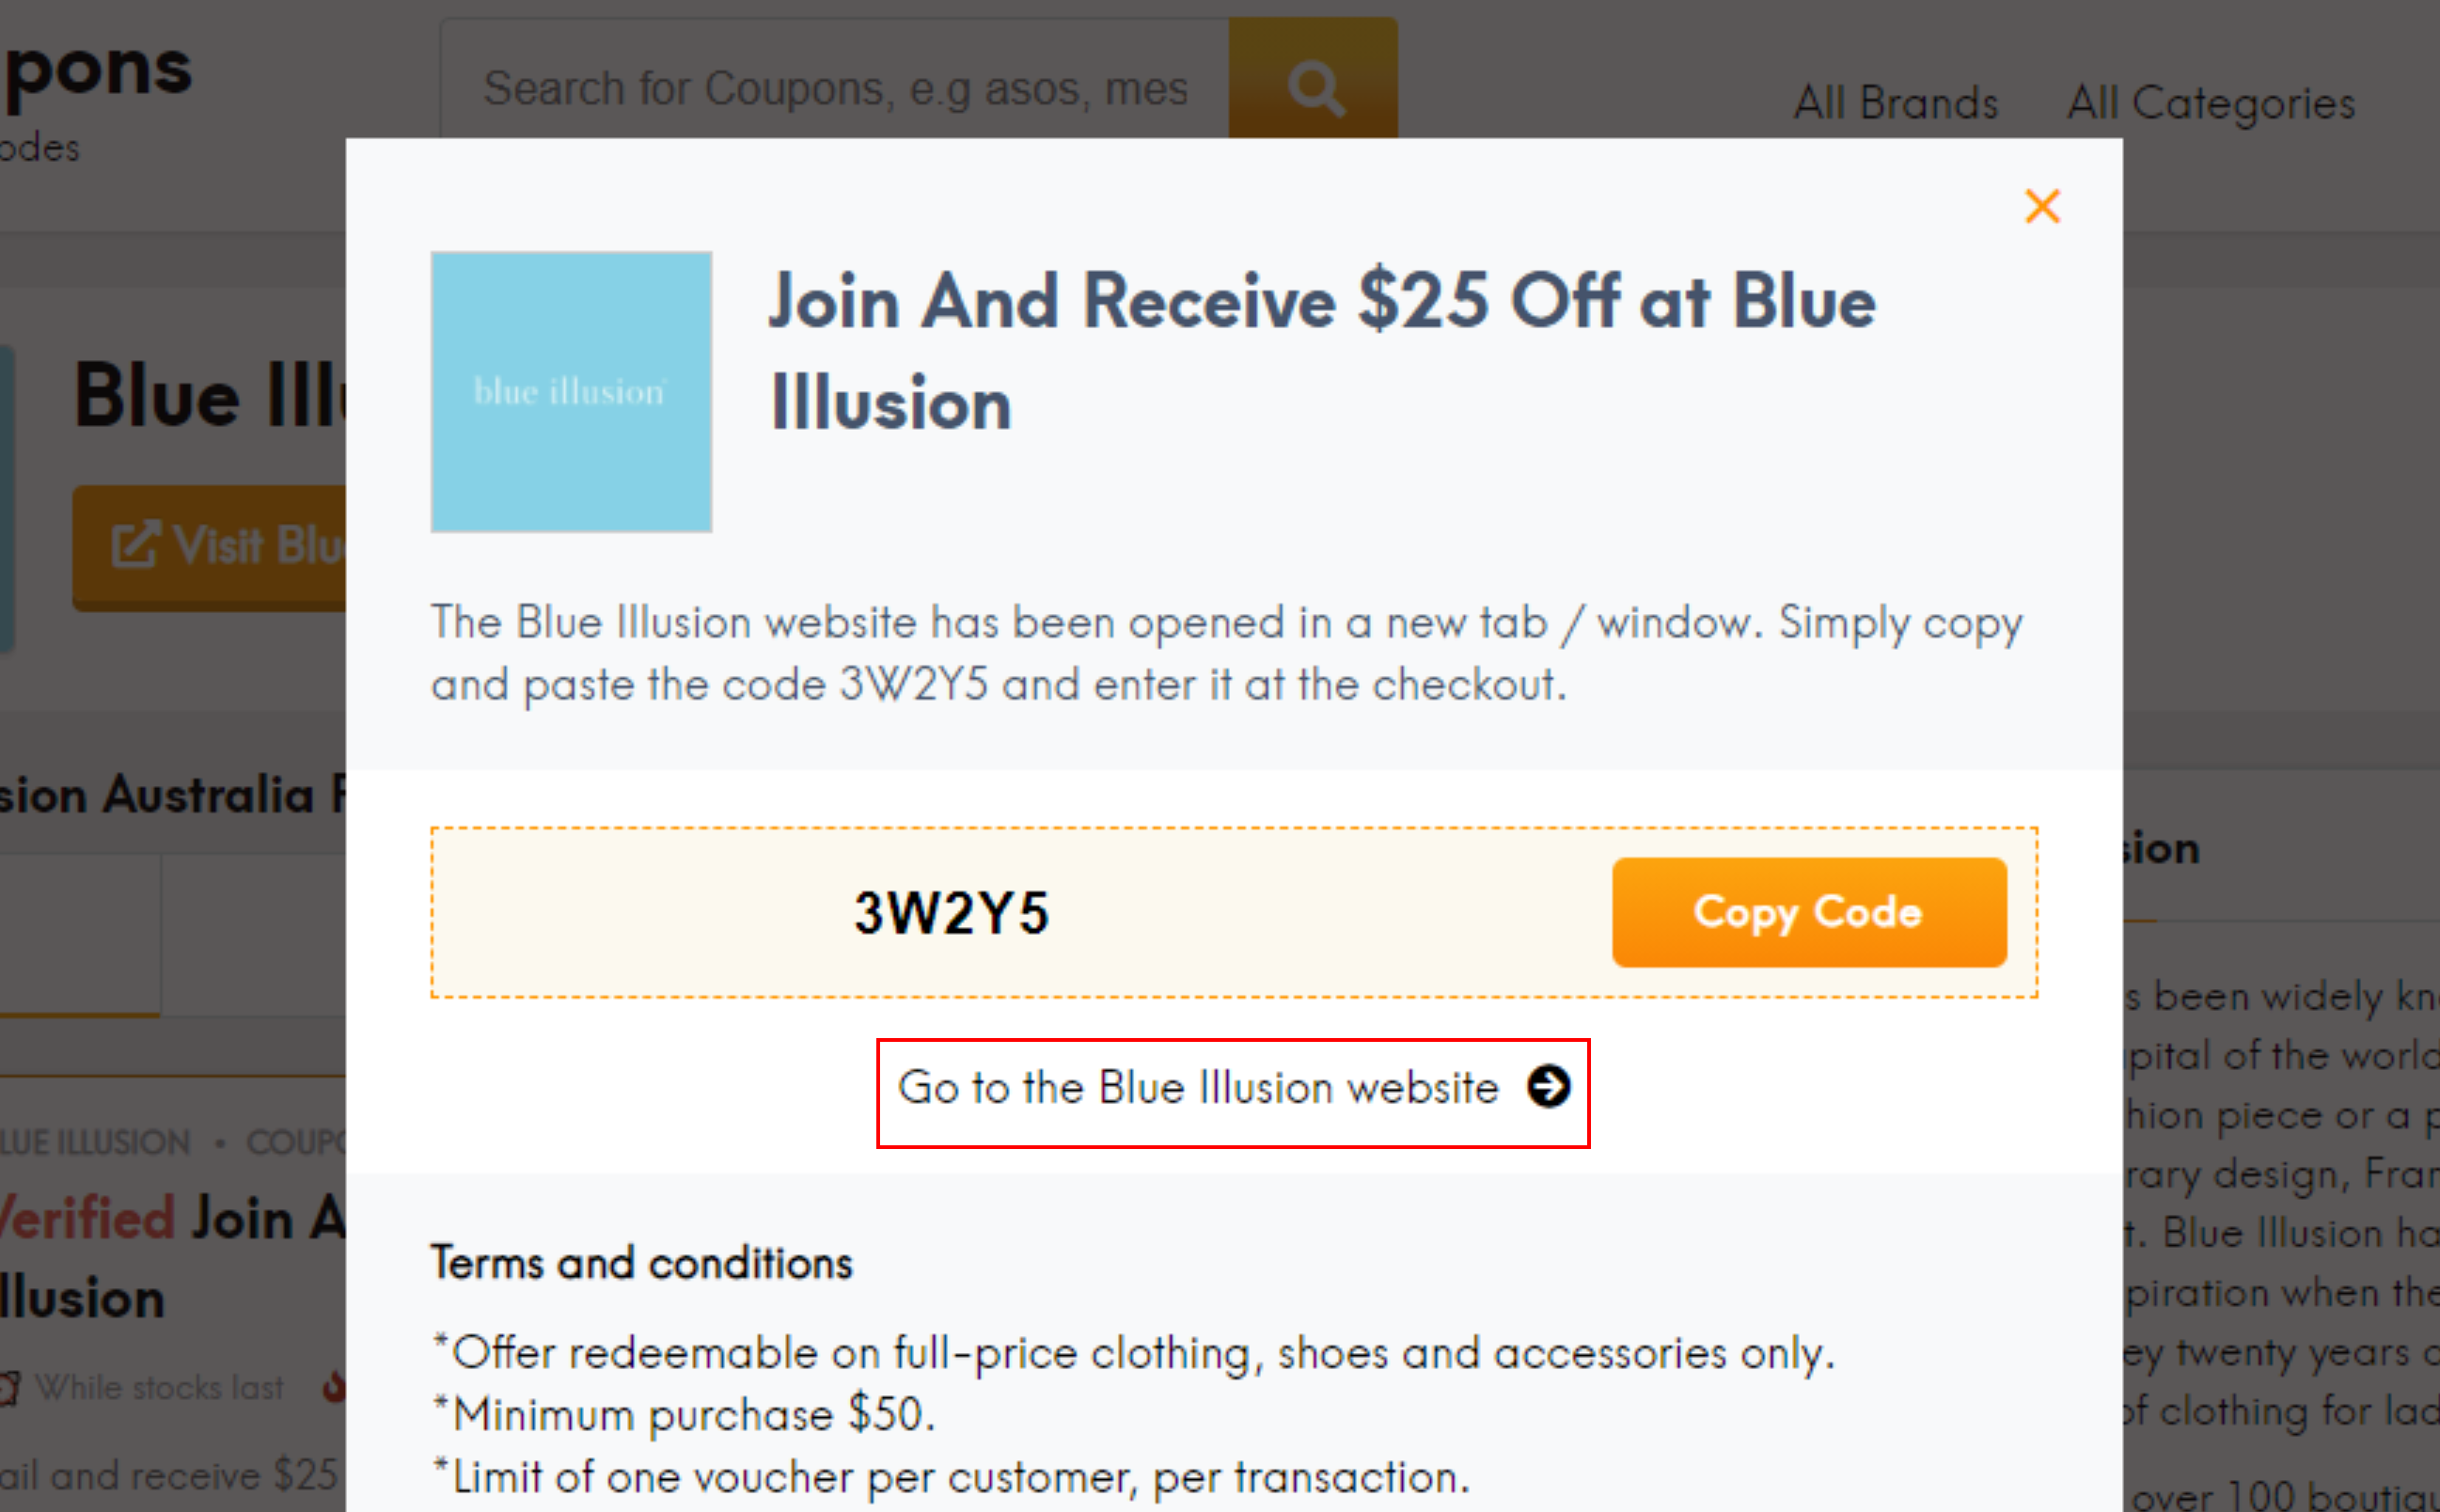 How do I use my Blue Illusion promo code?